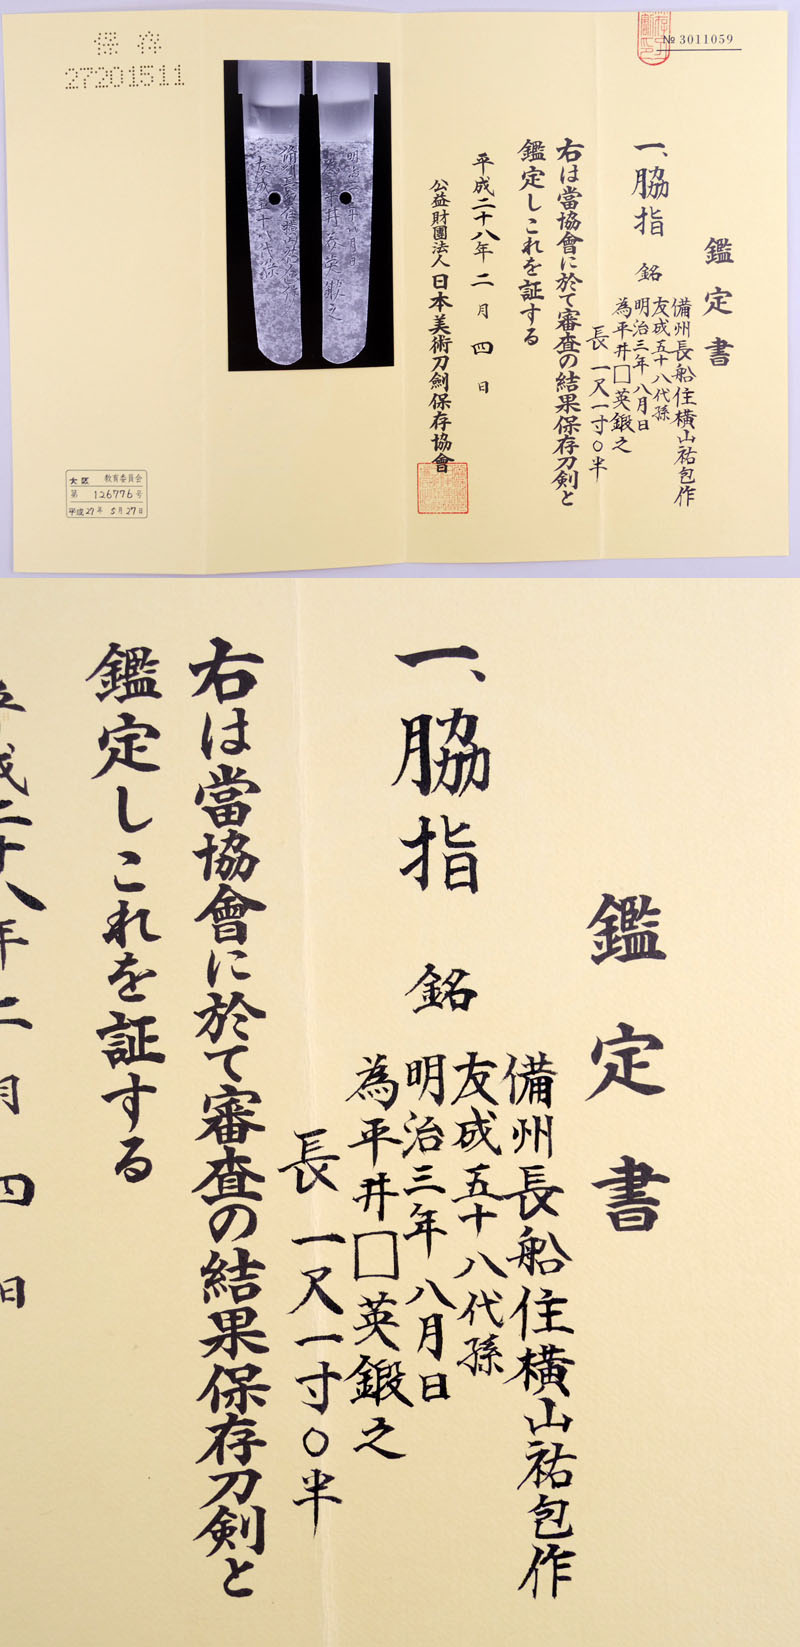 備州長船住横山祐包作 Picture of Certificate